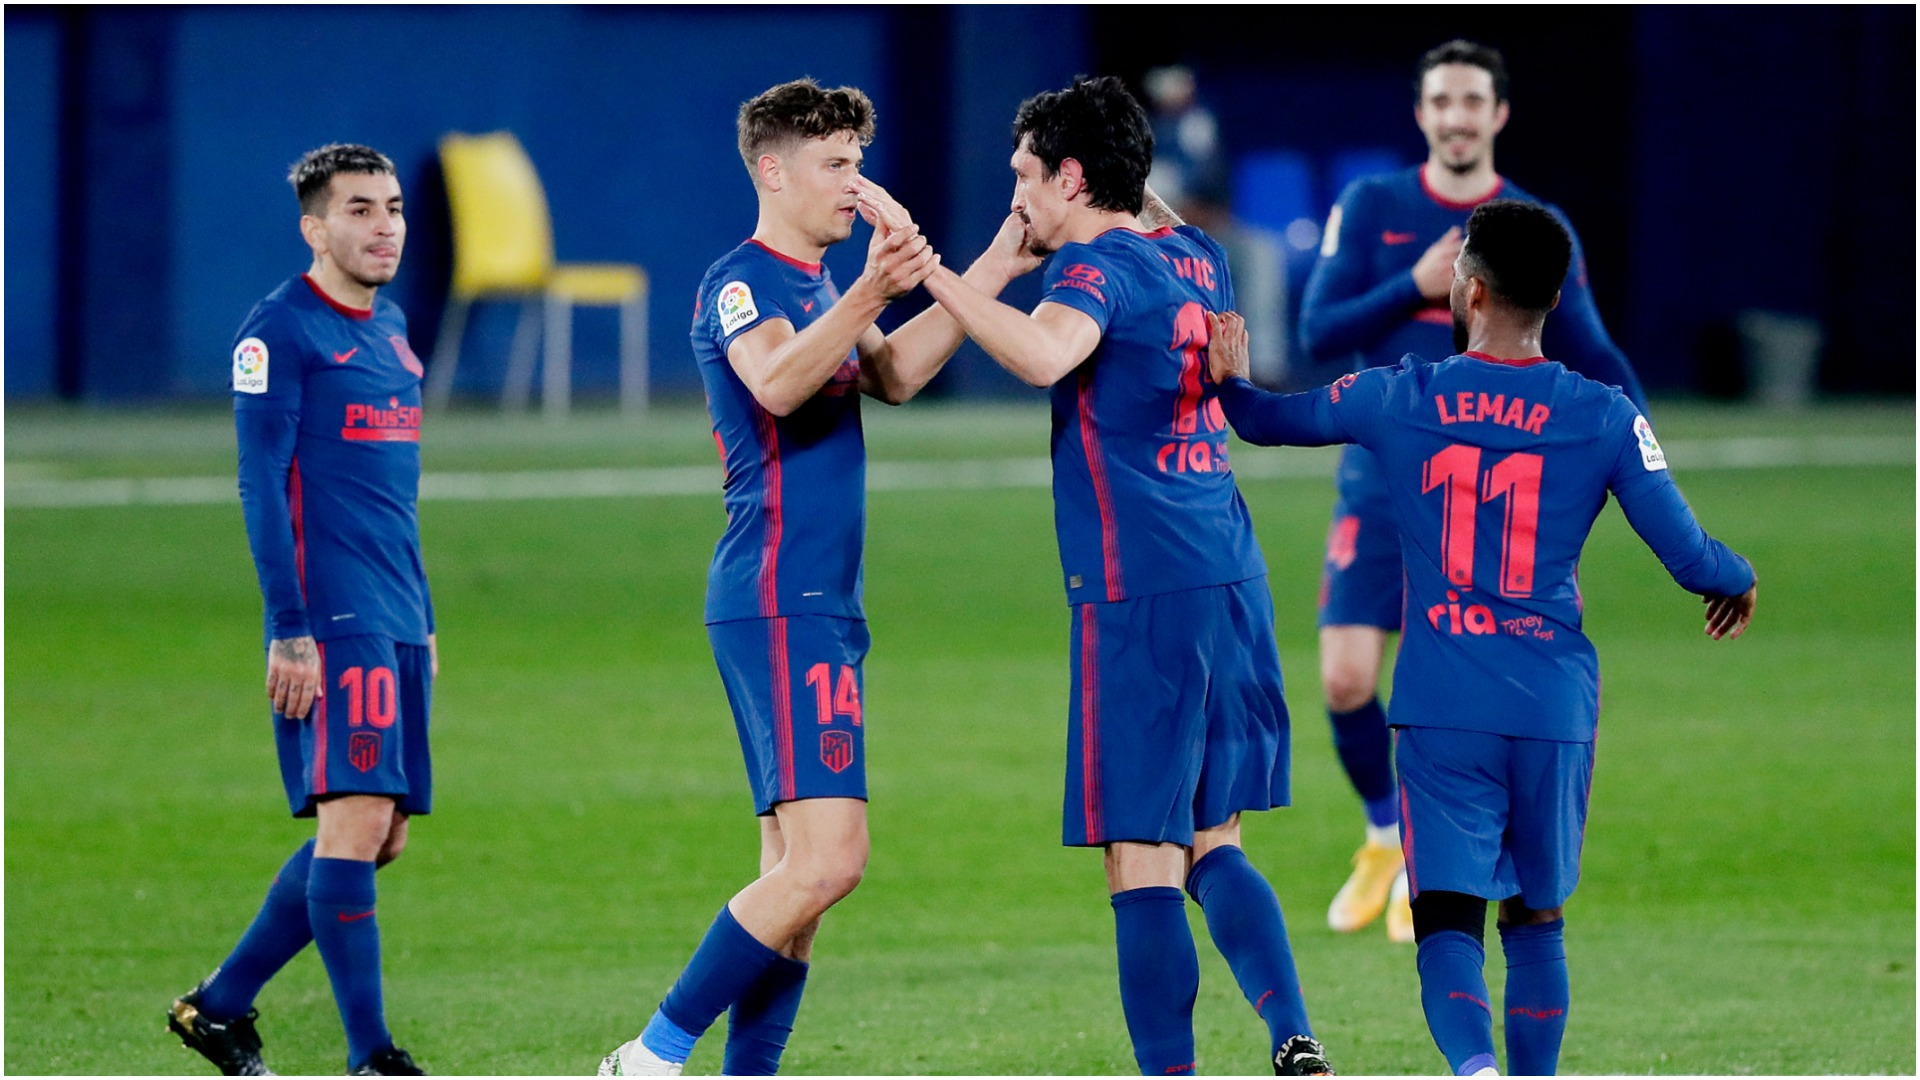 Villarreal 0-2 Atletico Madrid: Simeone's side revive LaLiga title bid